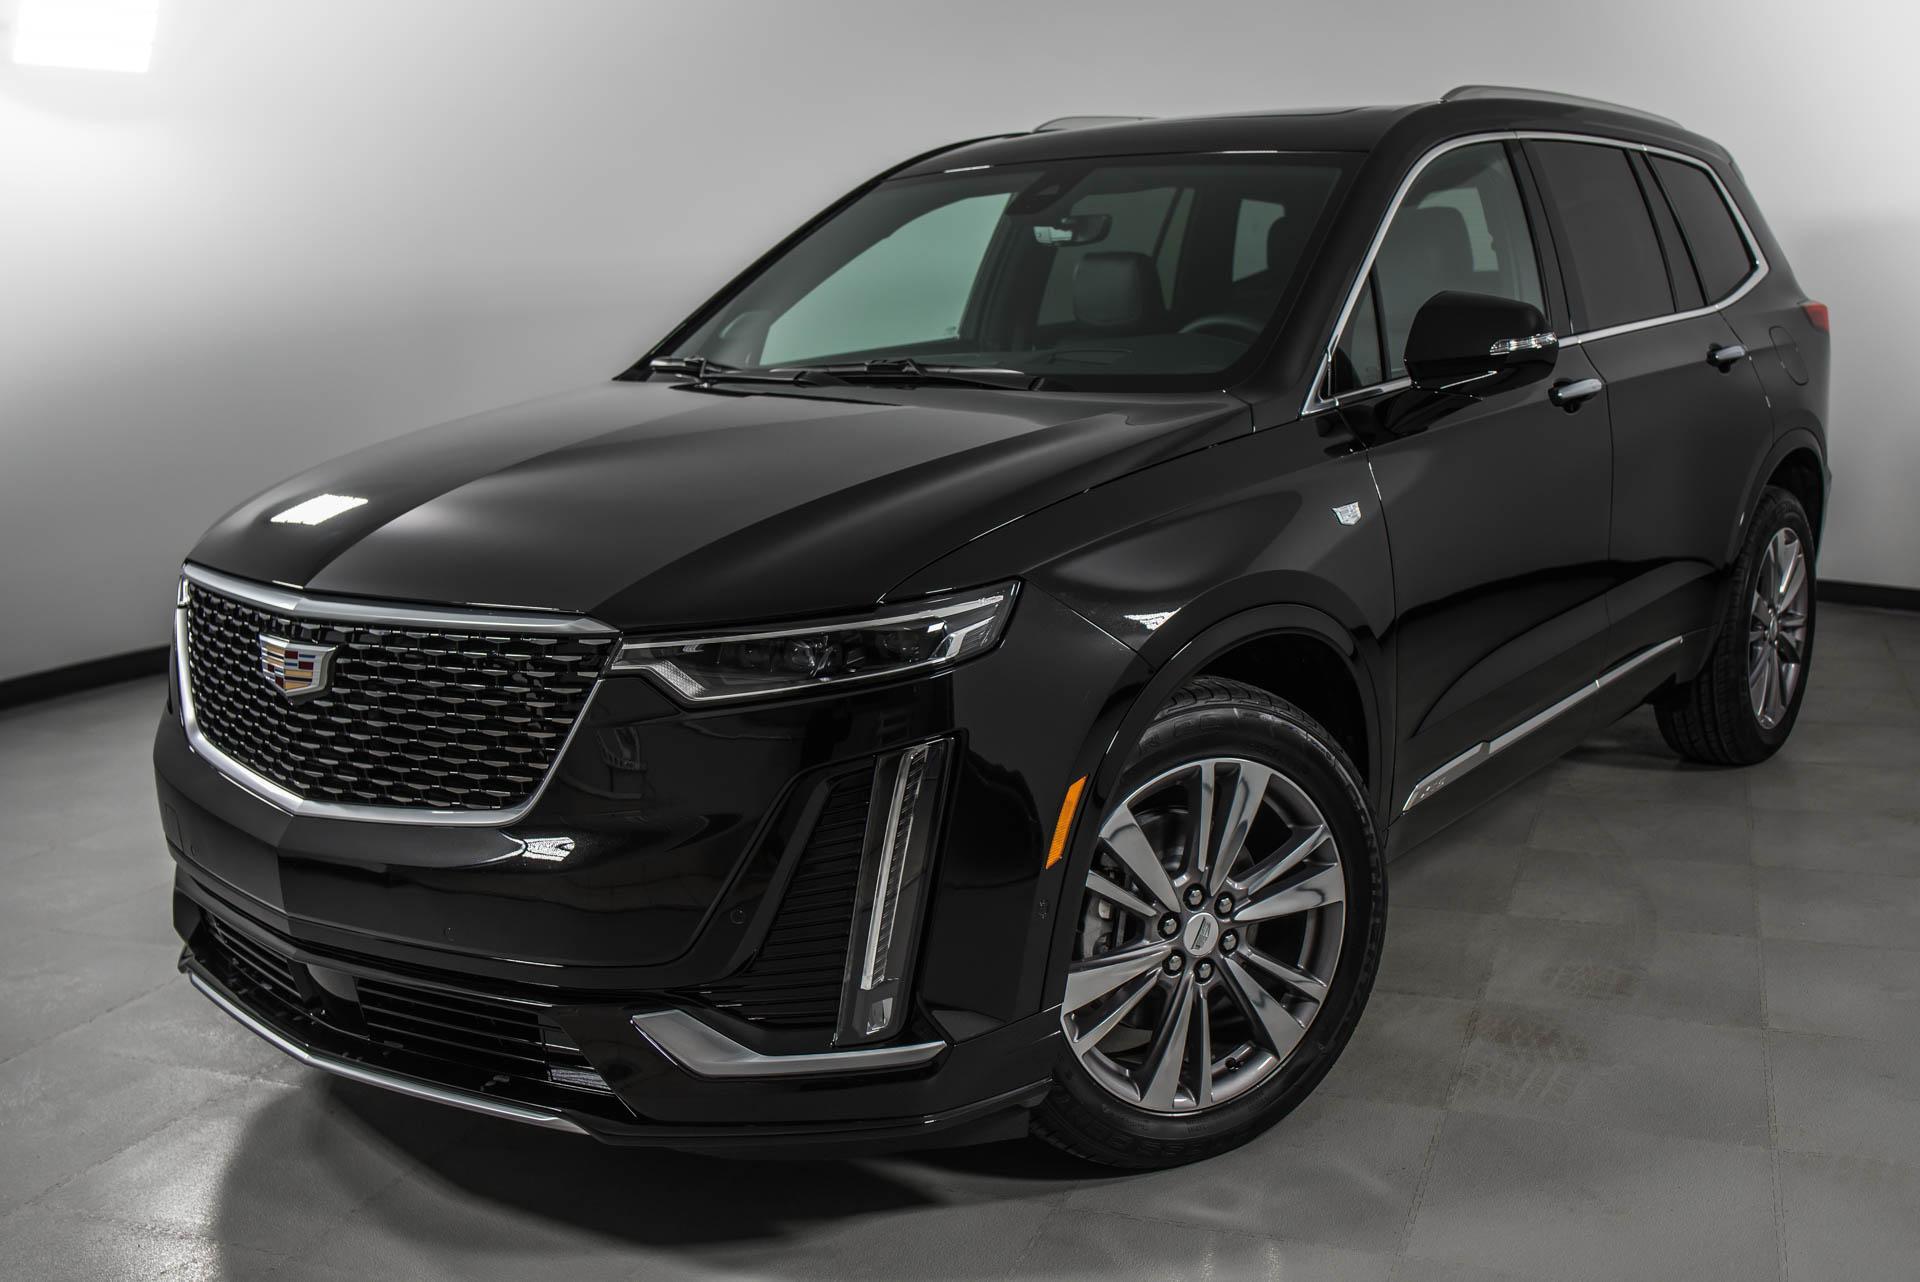 Cadillac XT6 2.0 (200 л.с.) АКПП, полный привод Premium Luxury